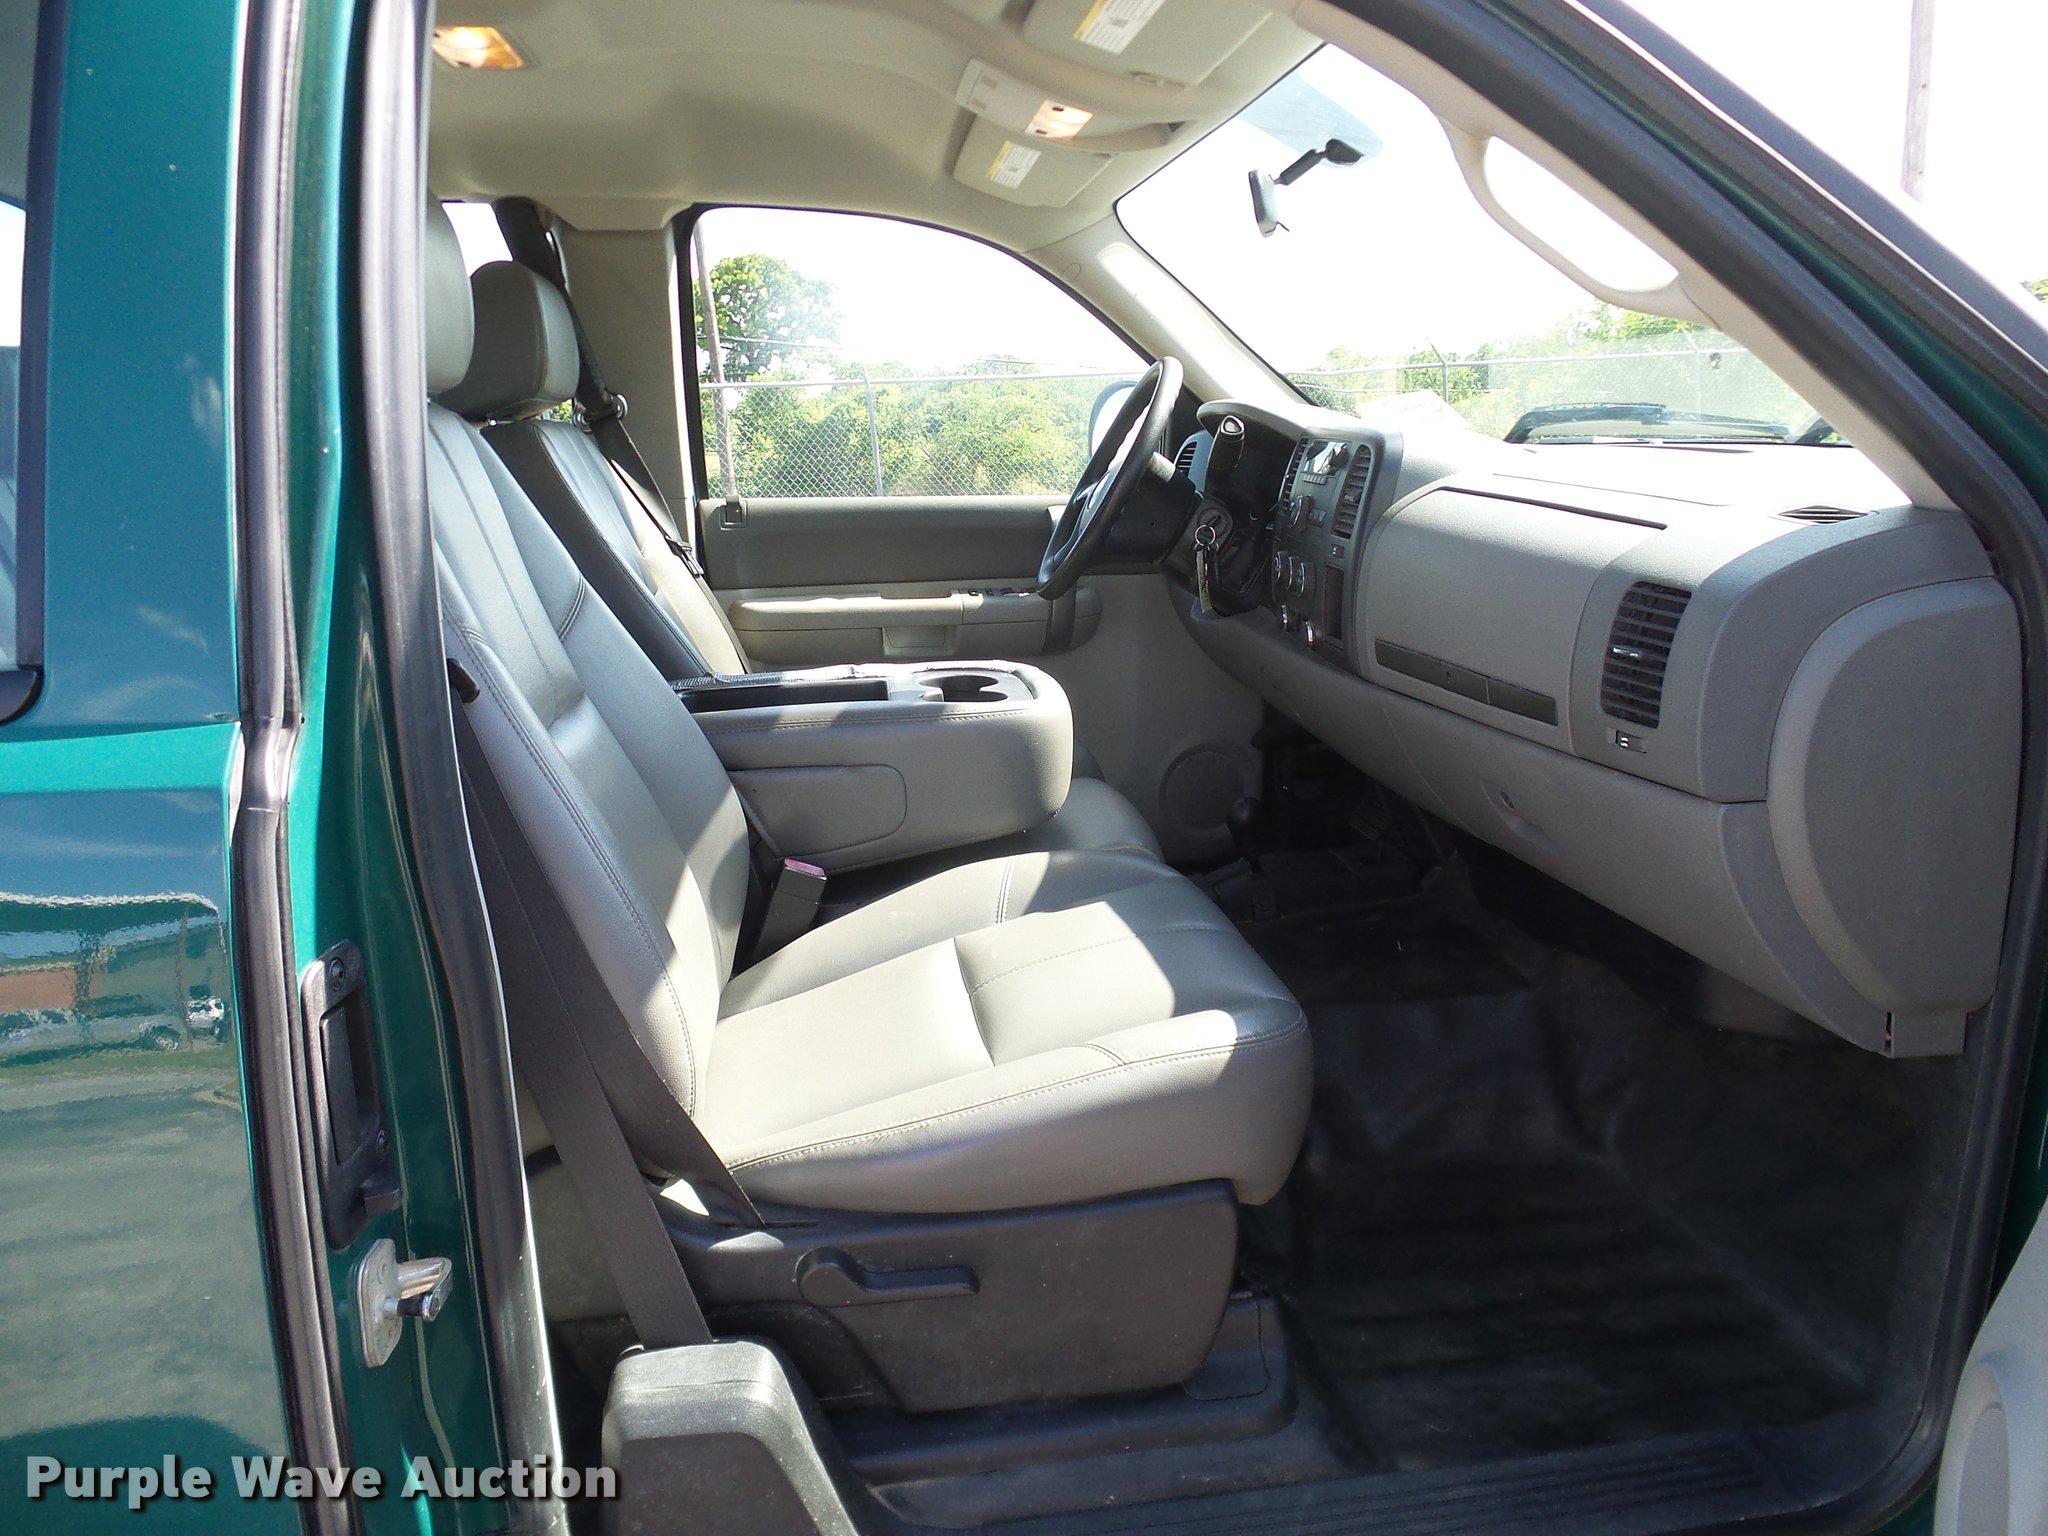 2008 Chevrolet Silverado 1500 Ext  Cab pickup truck | Item D